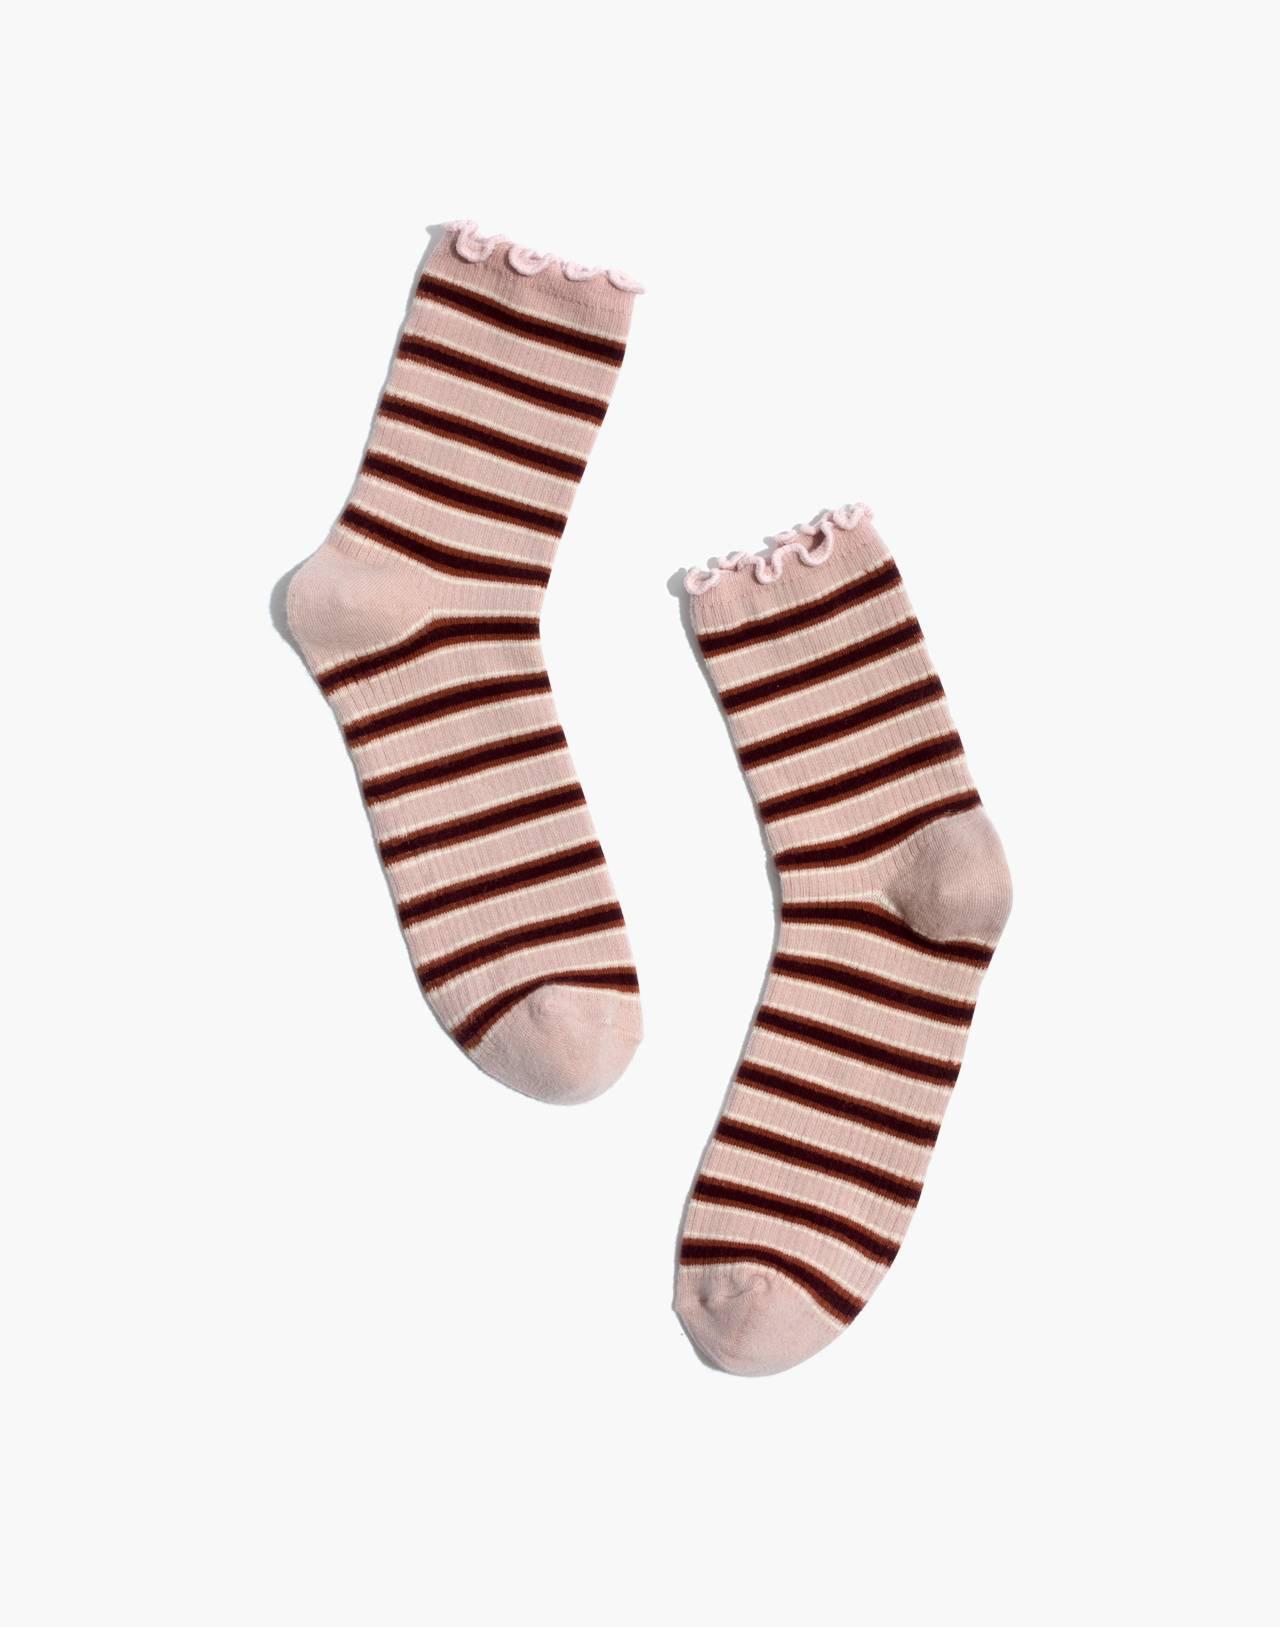 Diagonal Striped Ruffle-Edge Ankle Socks in wisteria dove multi image 1